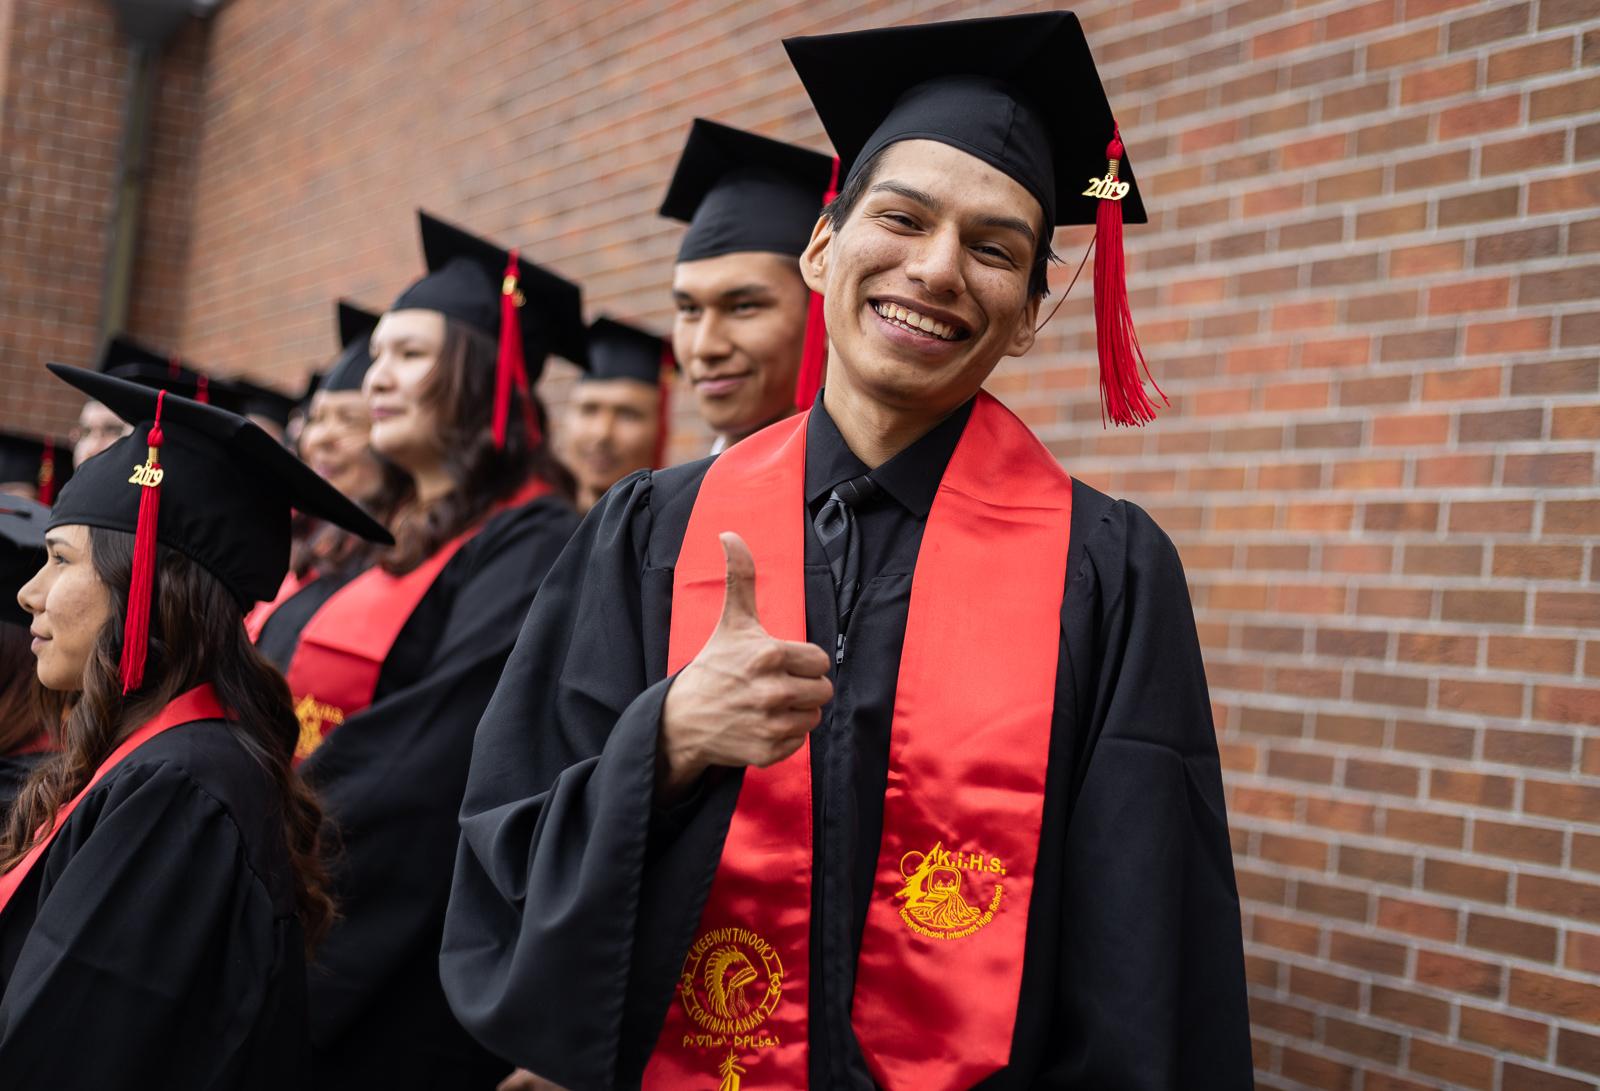 kihs-graduation-2019-fb-10.jpg